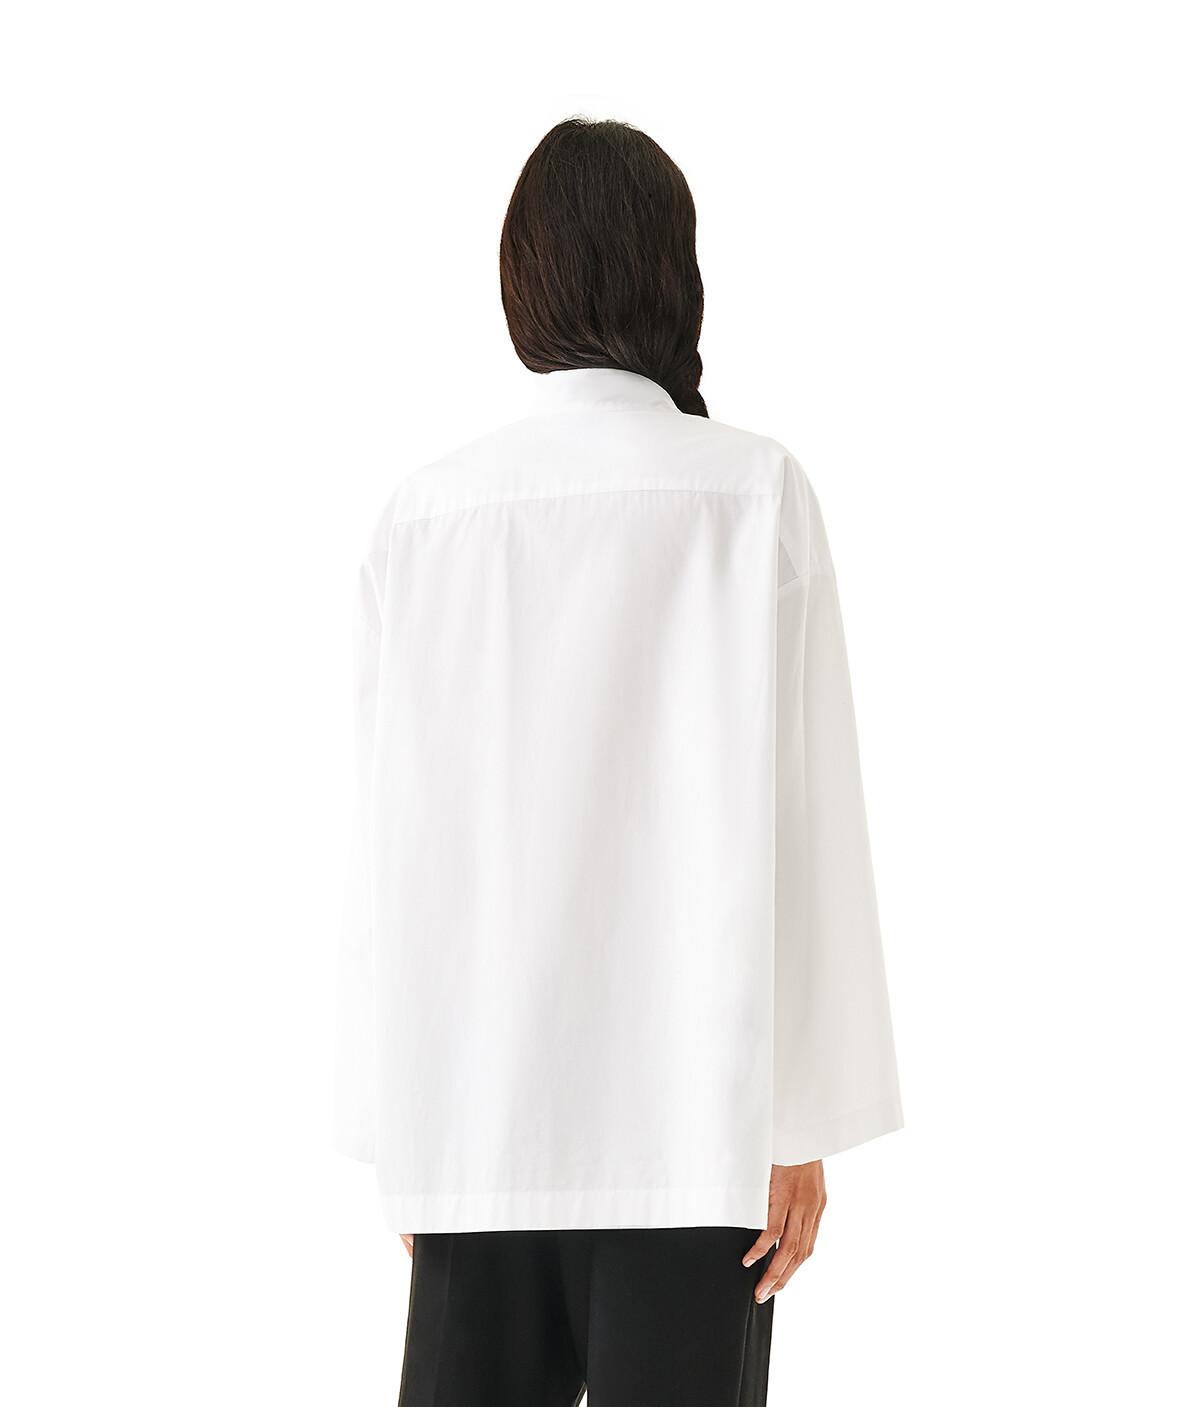 LOEWE Oversize Shirt White front